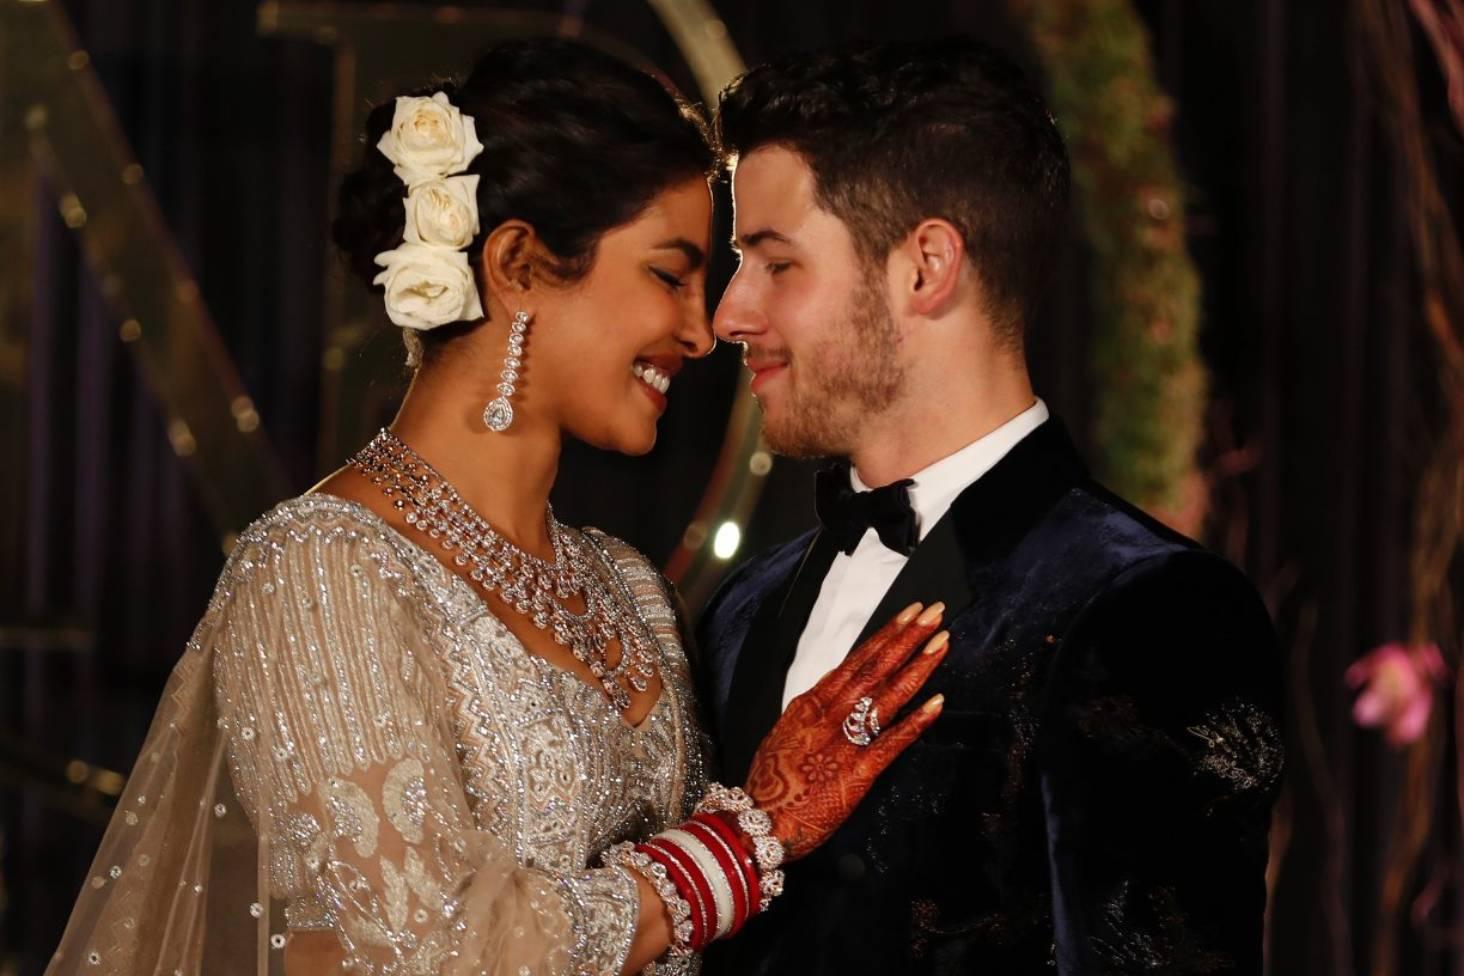 d5cce28c69 See Priyanka Chopra s stunning Ralph Lauren wedding dress and 23-metre veil